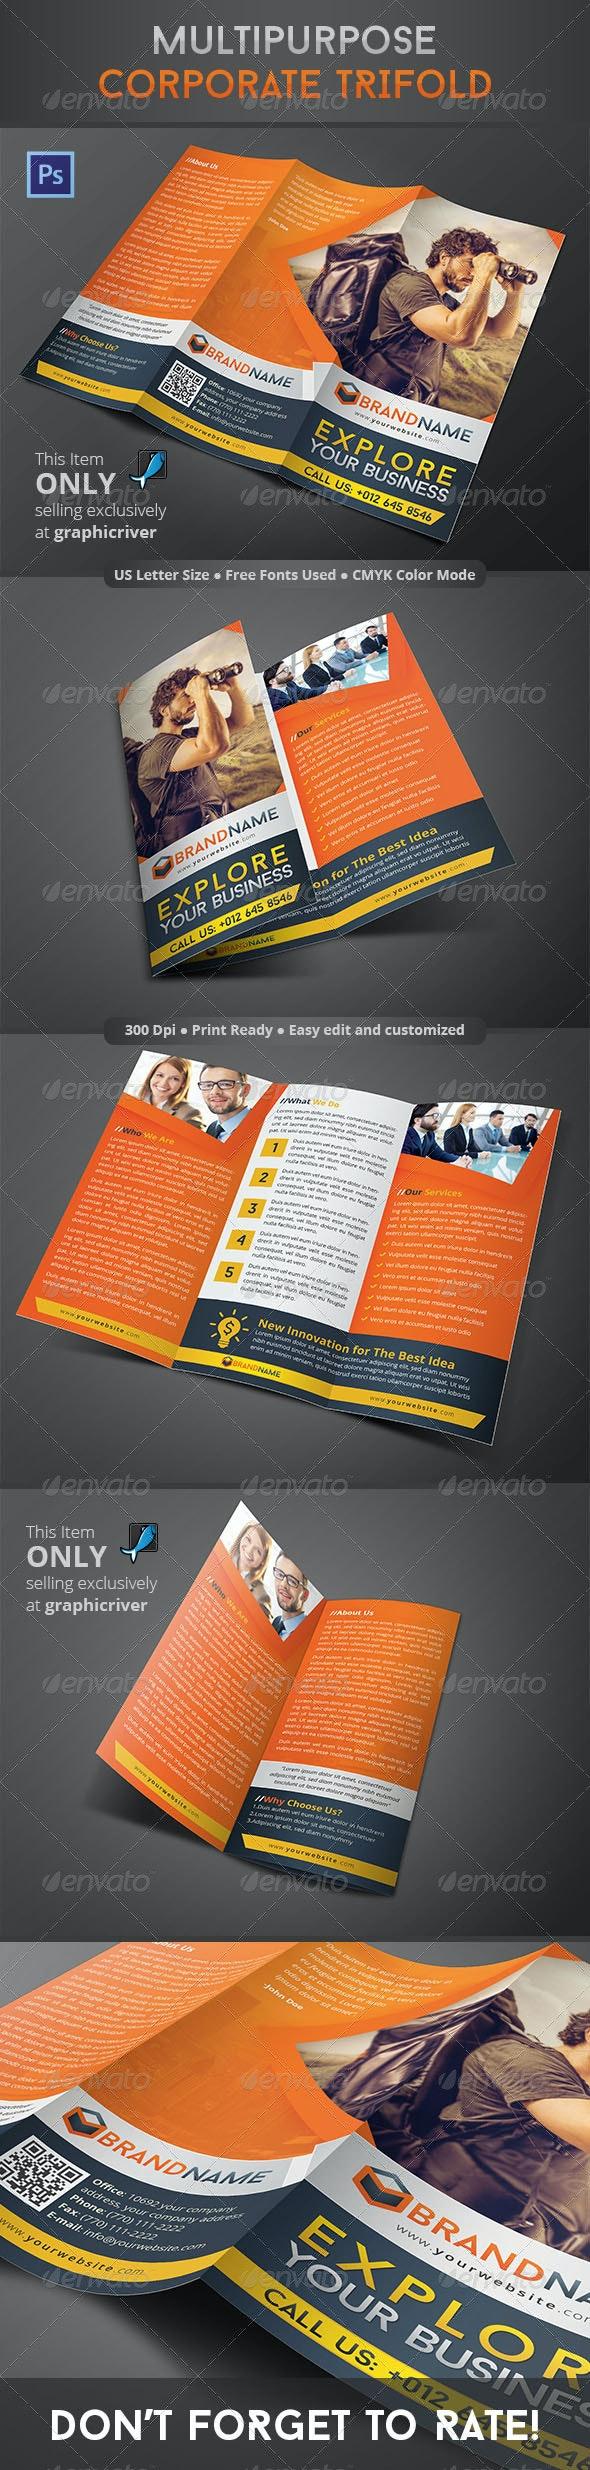 Multipurpose Corporate Trifold - Corporate Brochures